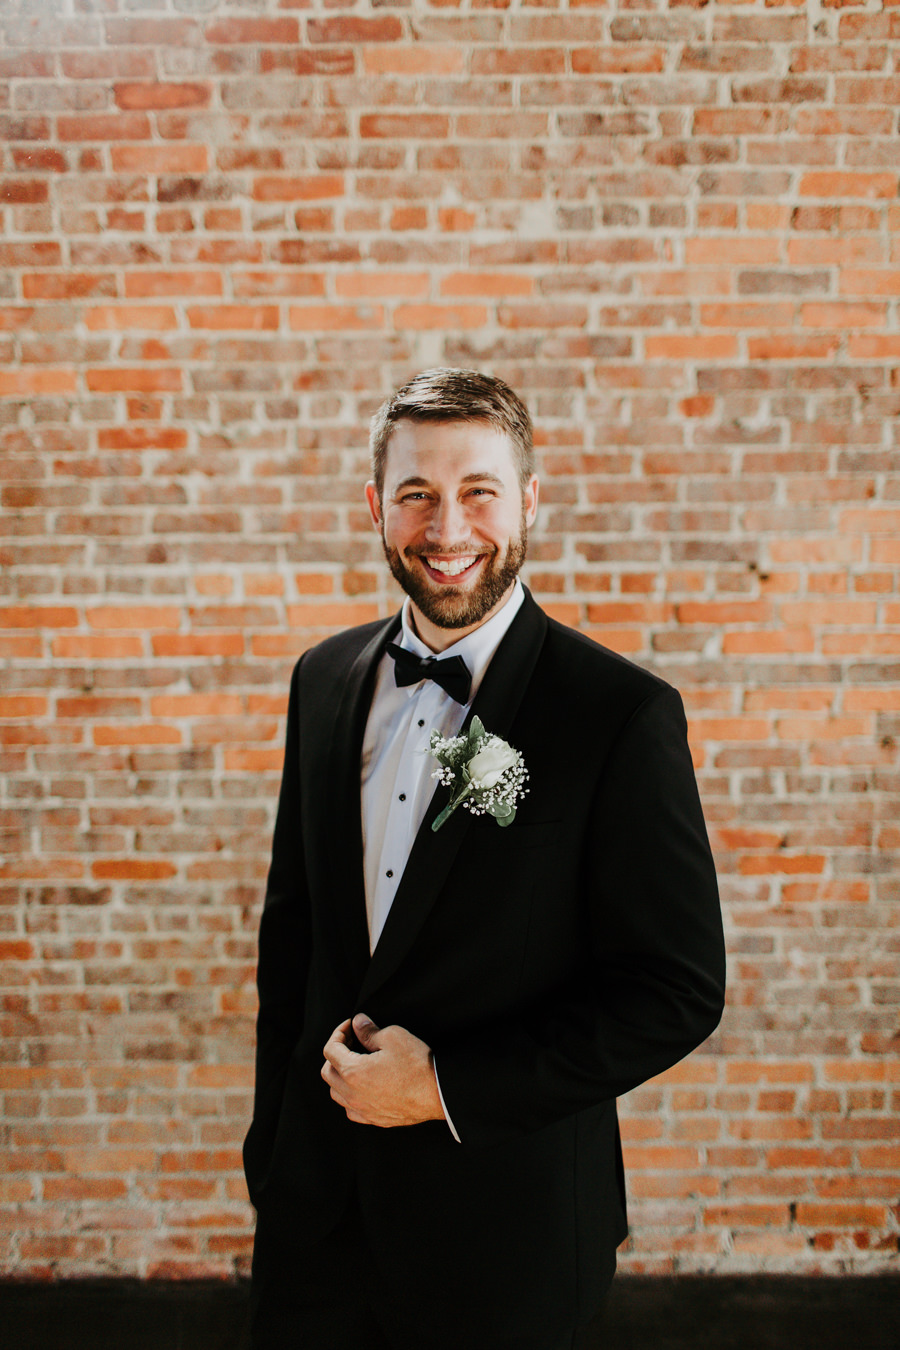 Tampa Heights Industrial Wedding at Cavu Emmy RJ-28.jpg